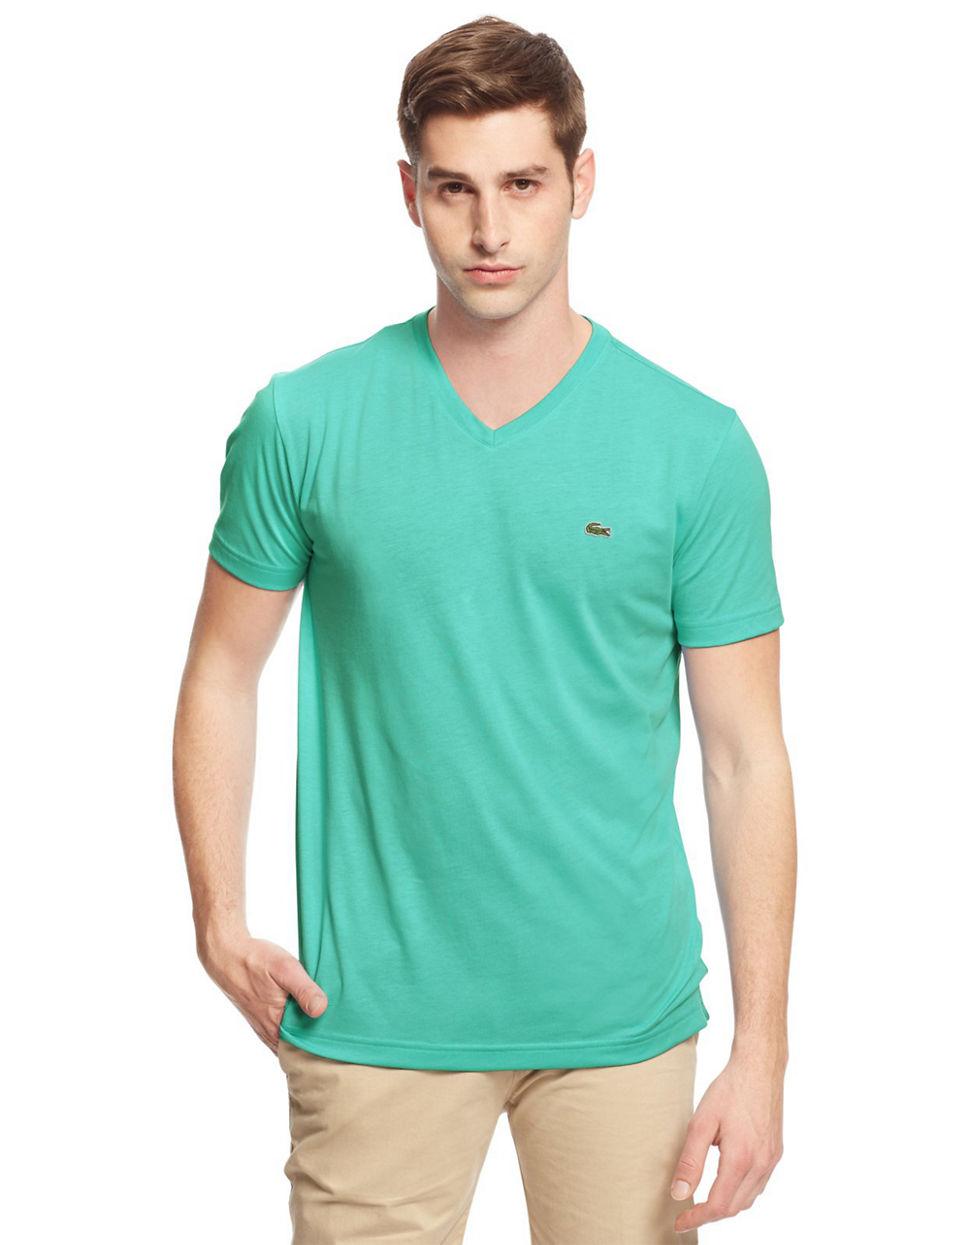 lacoste v neck cotton tee in green for men lyst. Black Bedroom Furniture Sets. Home Design Ideas